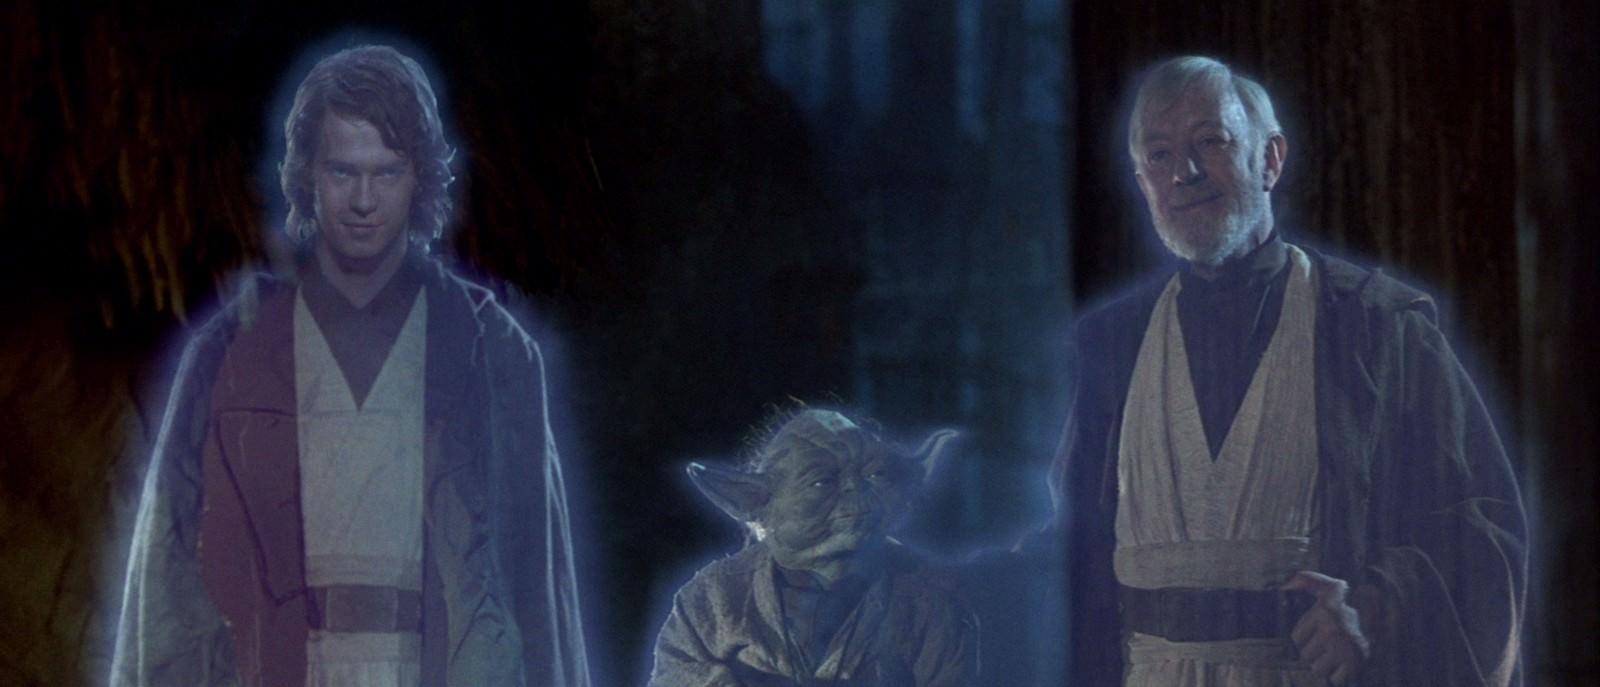 Movie, Star Wars Episode VI: Return of the Jedi(美國, 1983) / 星際大戰六部曲:絕地大反攻(台灣) / 星球大战VI:绝地归来(中國) / 星球大戰:武士復仇(香港), 電影劇照